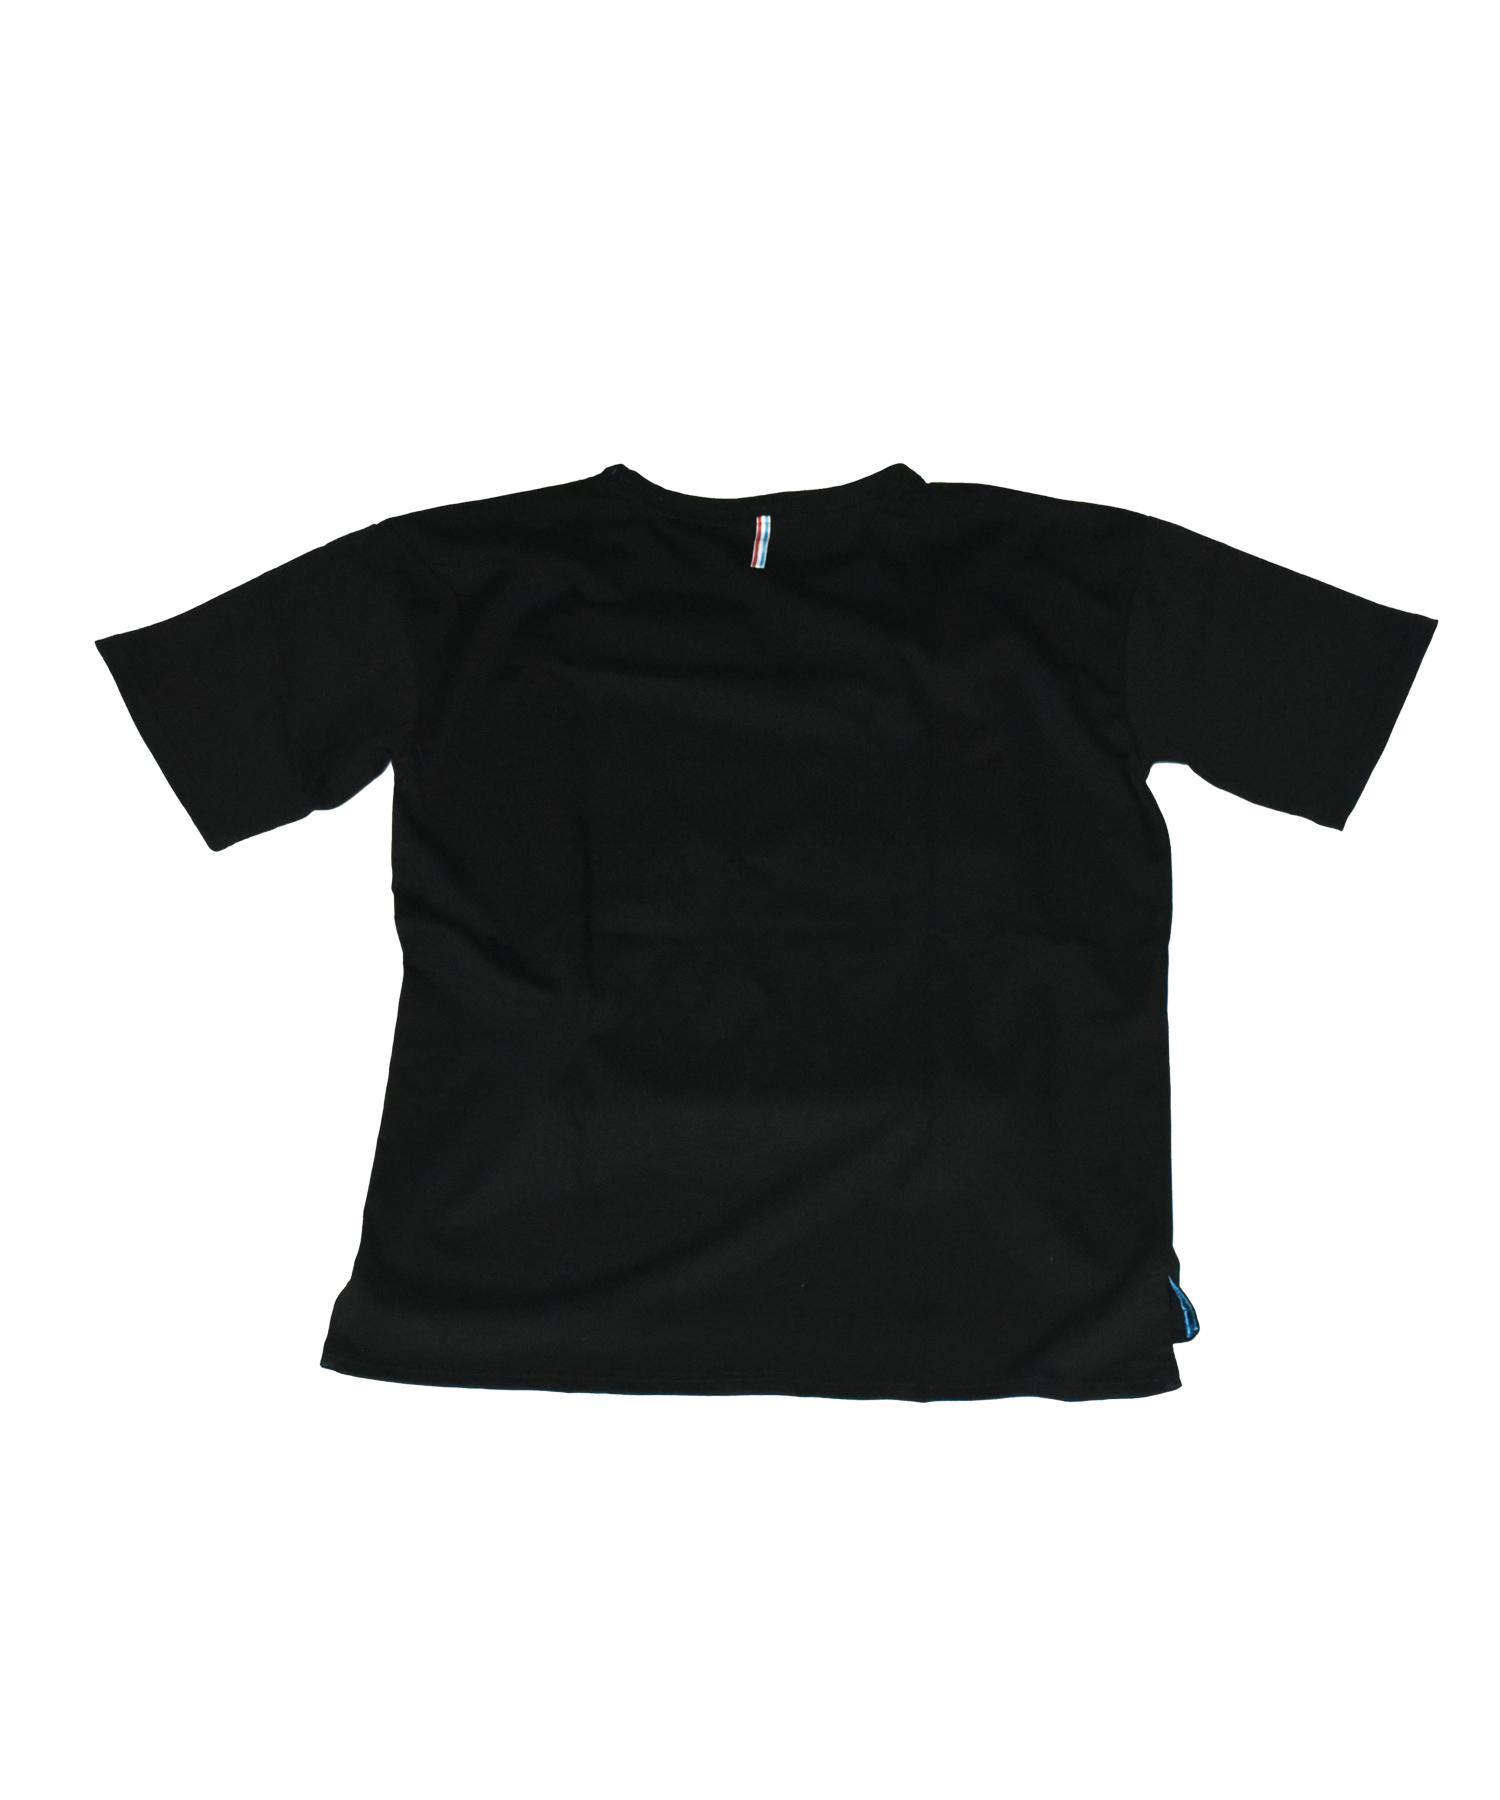 OOPS T-シャツ06